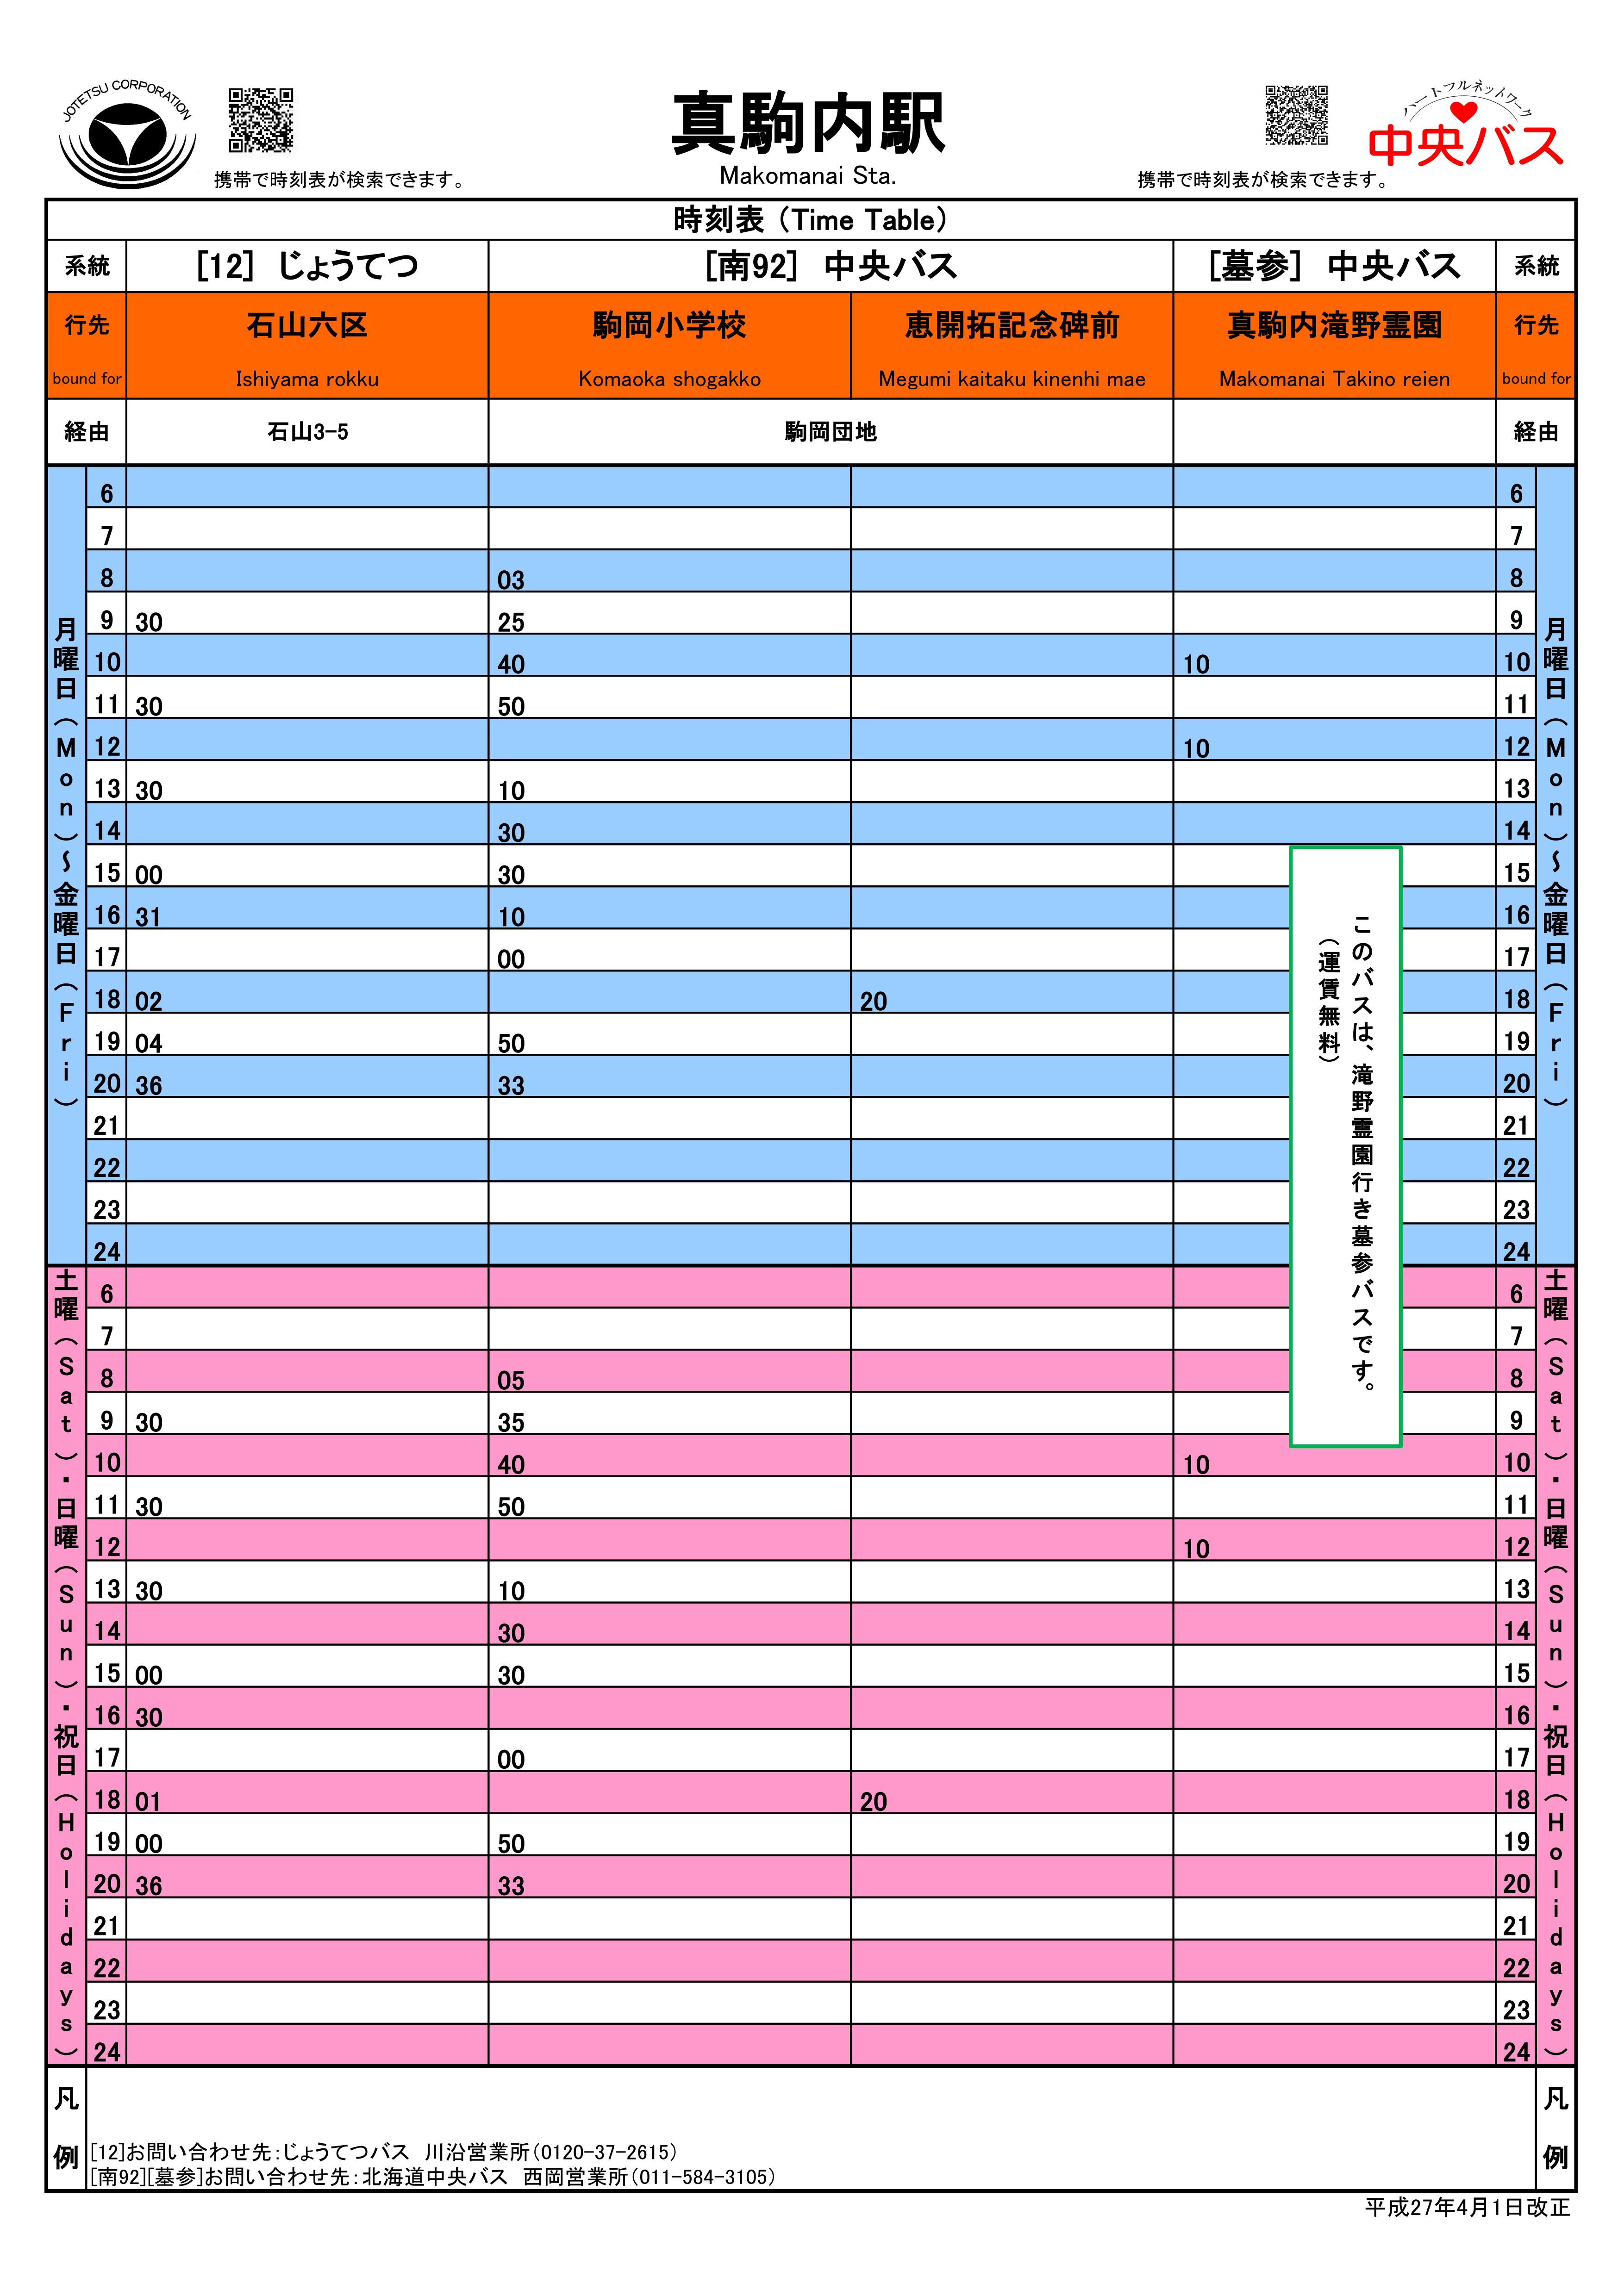 バス真駒内駅時刻表